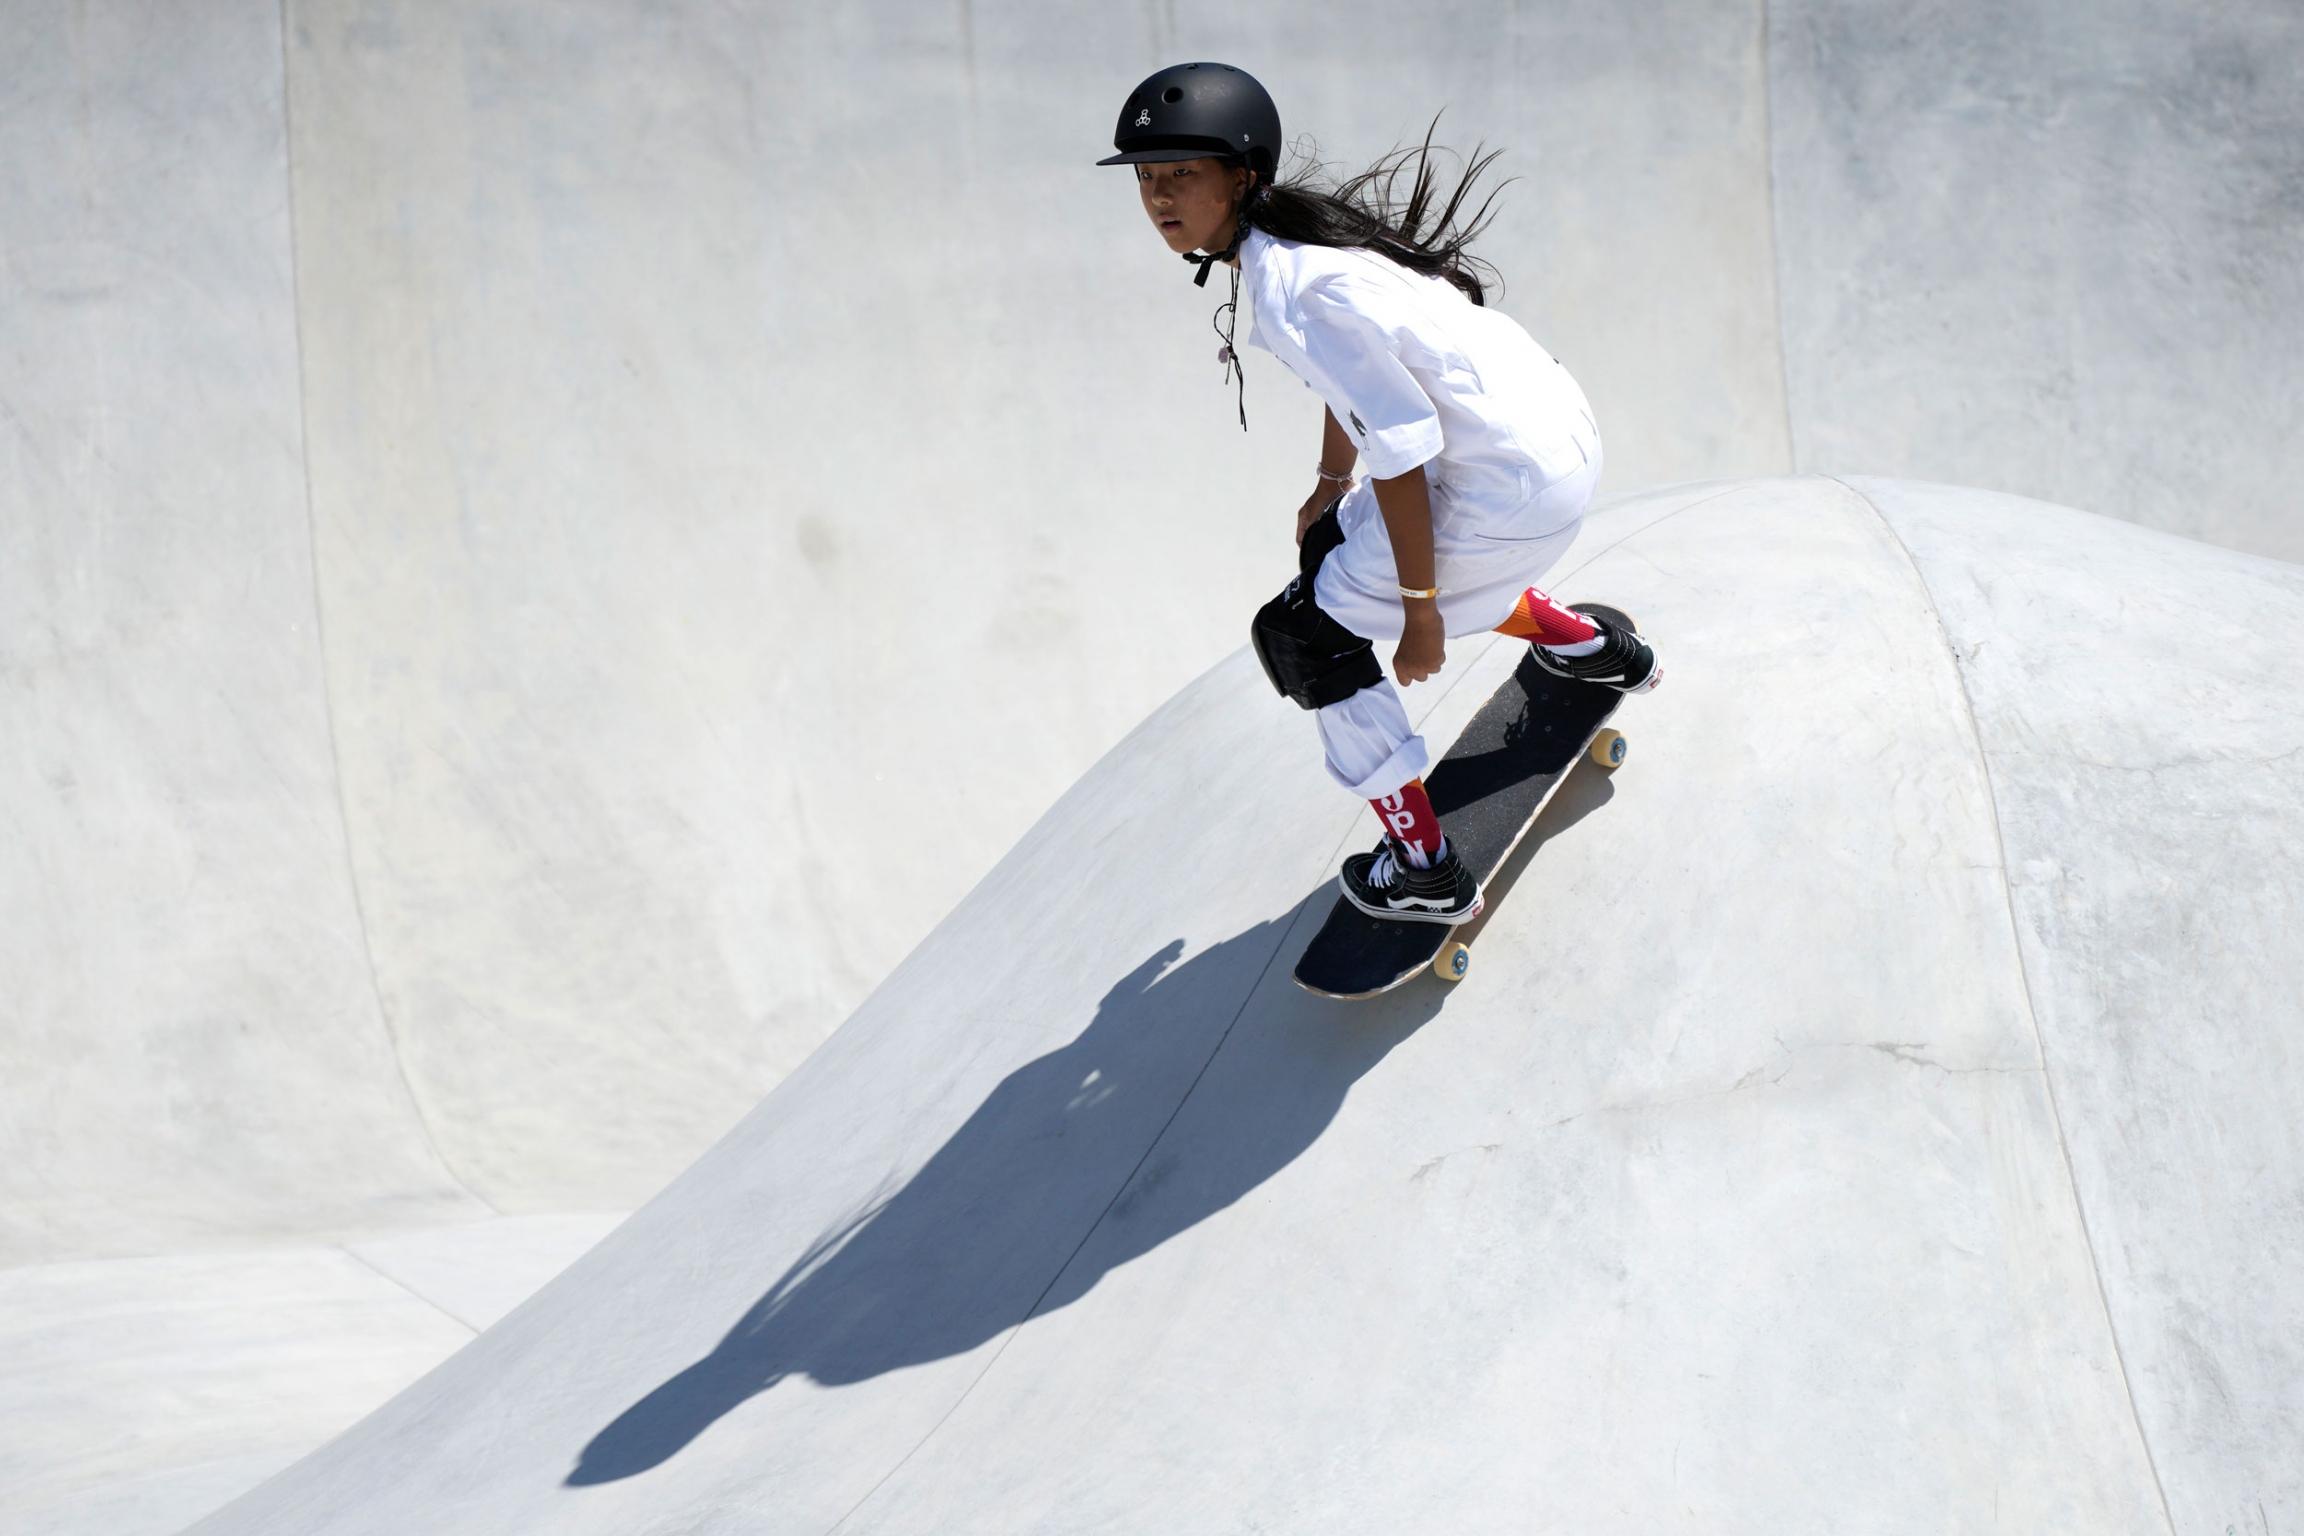 Kokona Hiraki is shown wearing all white and black knee pads while riding a skateboard.